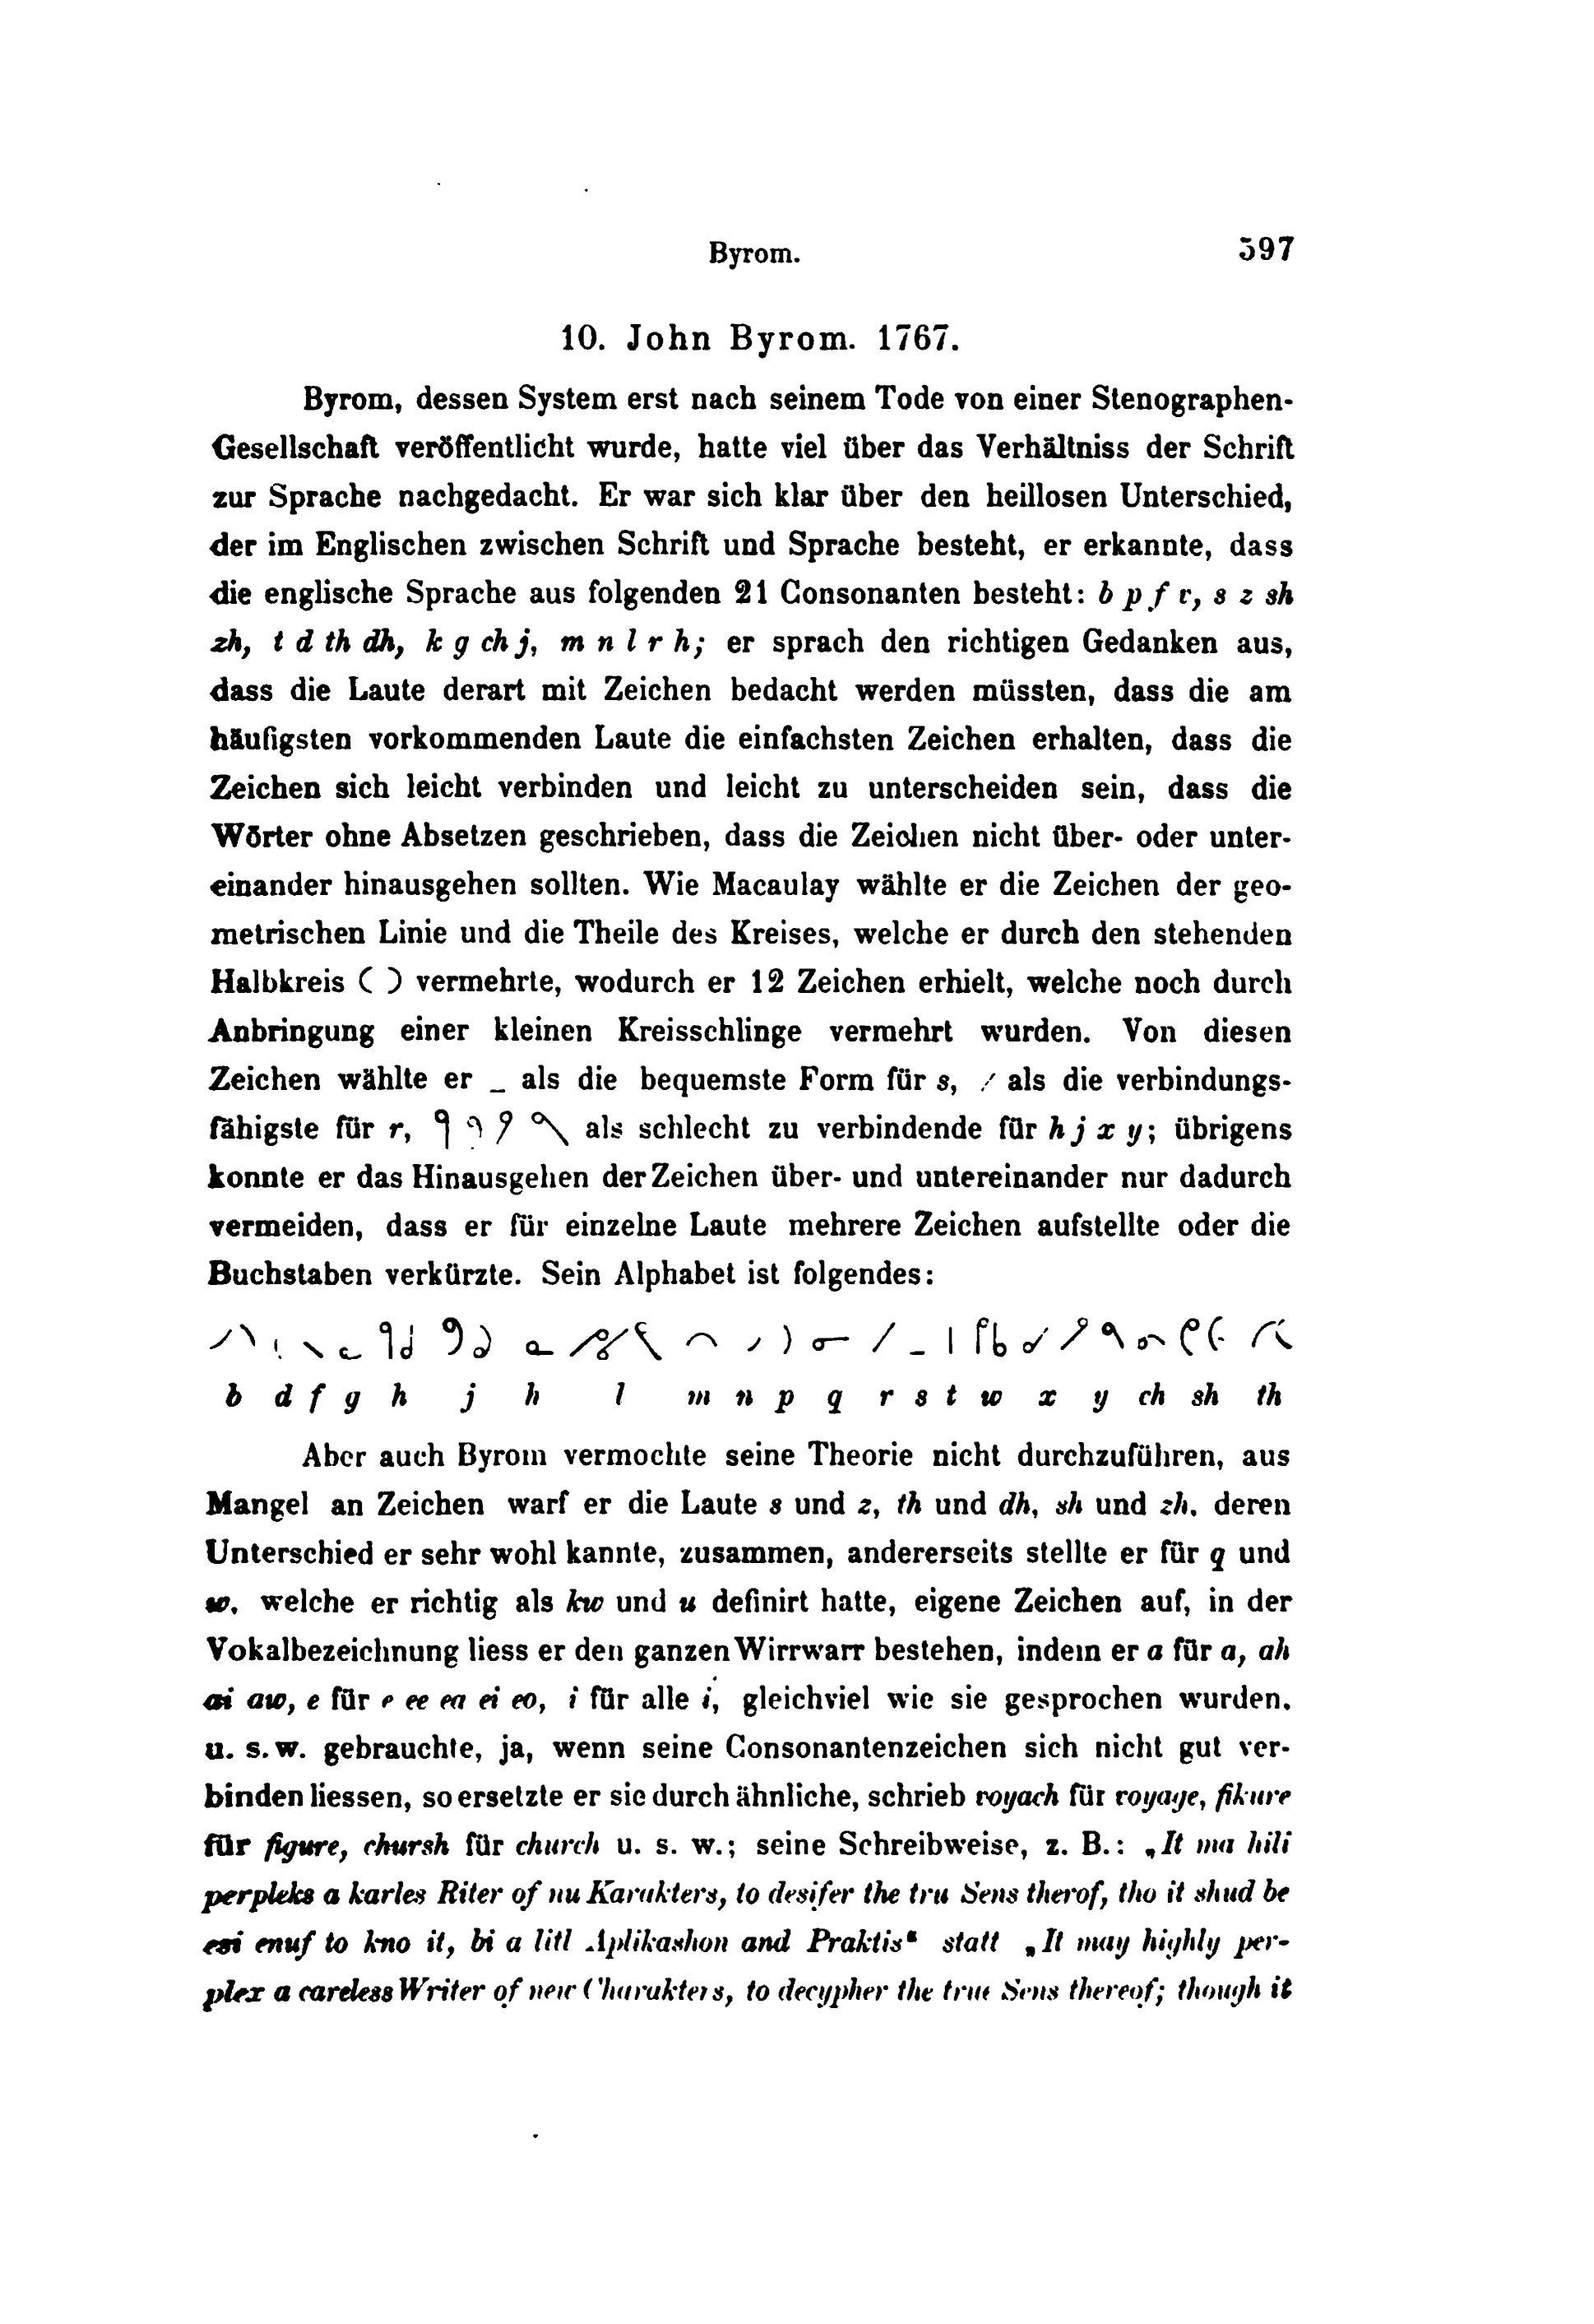 File:Illustrirte Geschichte der Schrift (Faulmann) 686.jpg ...